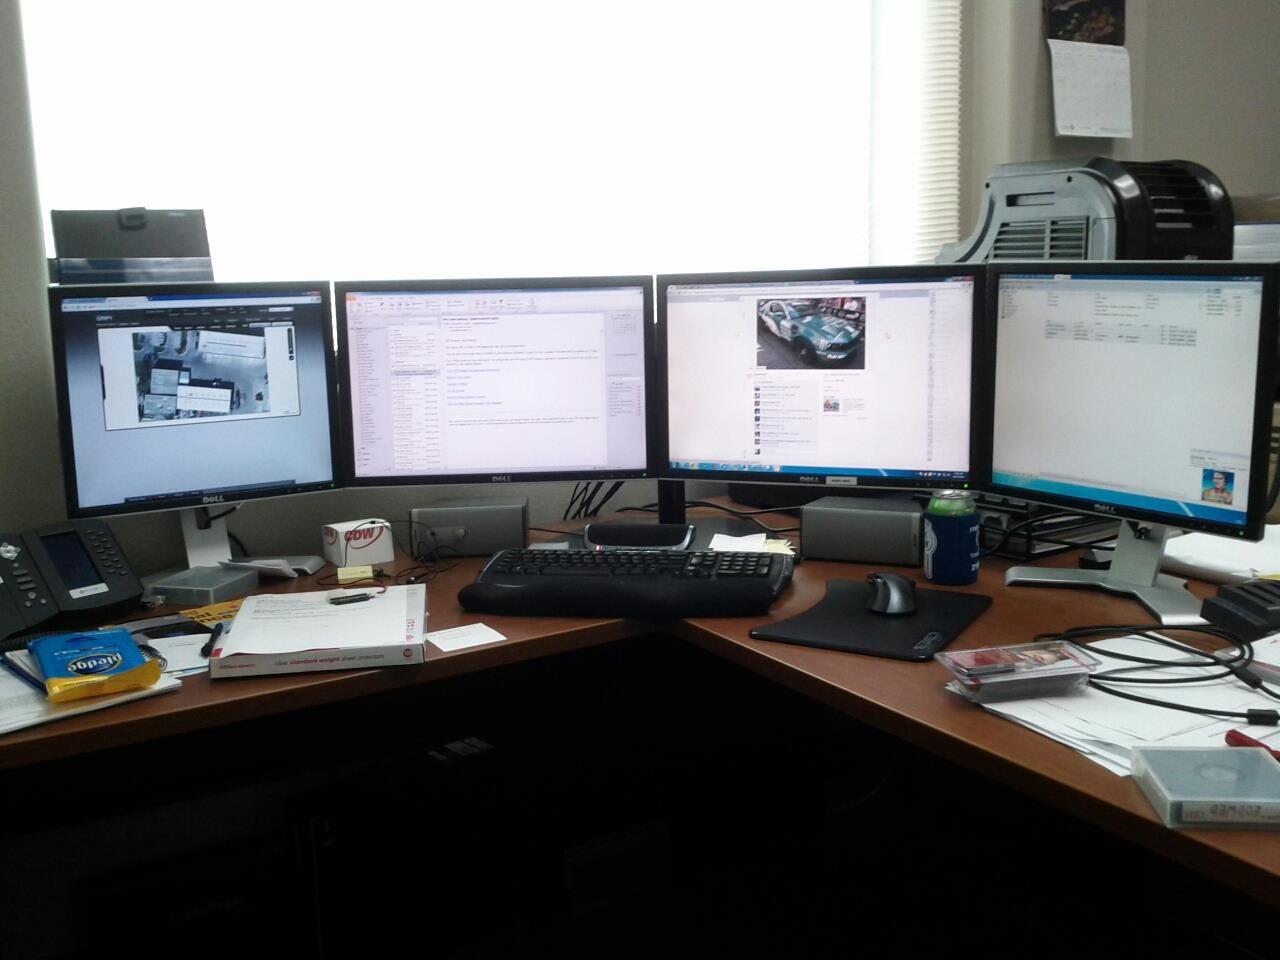 4 monitor setup multi monitor setup i like computer setup rh pinterest com